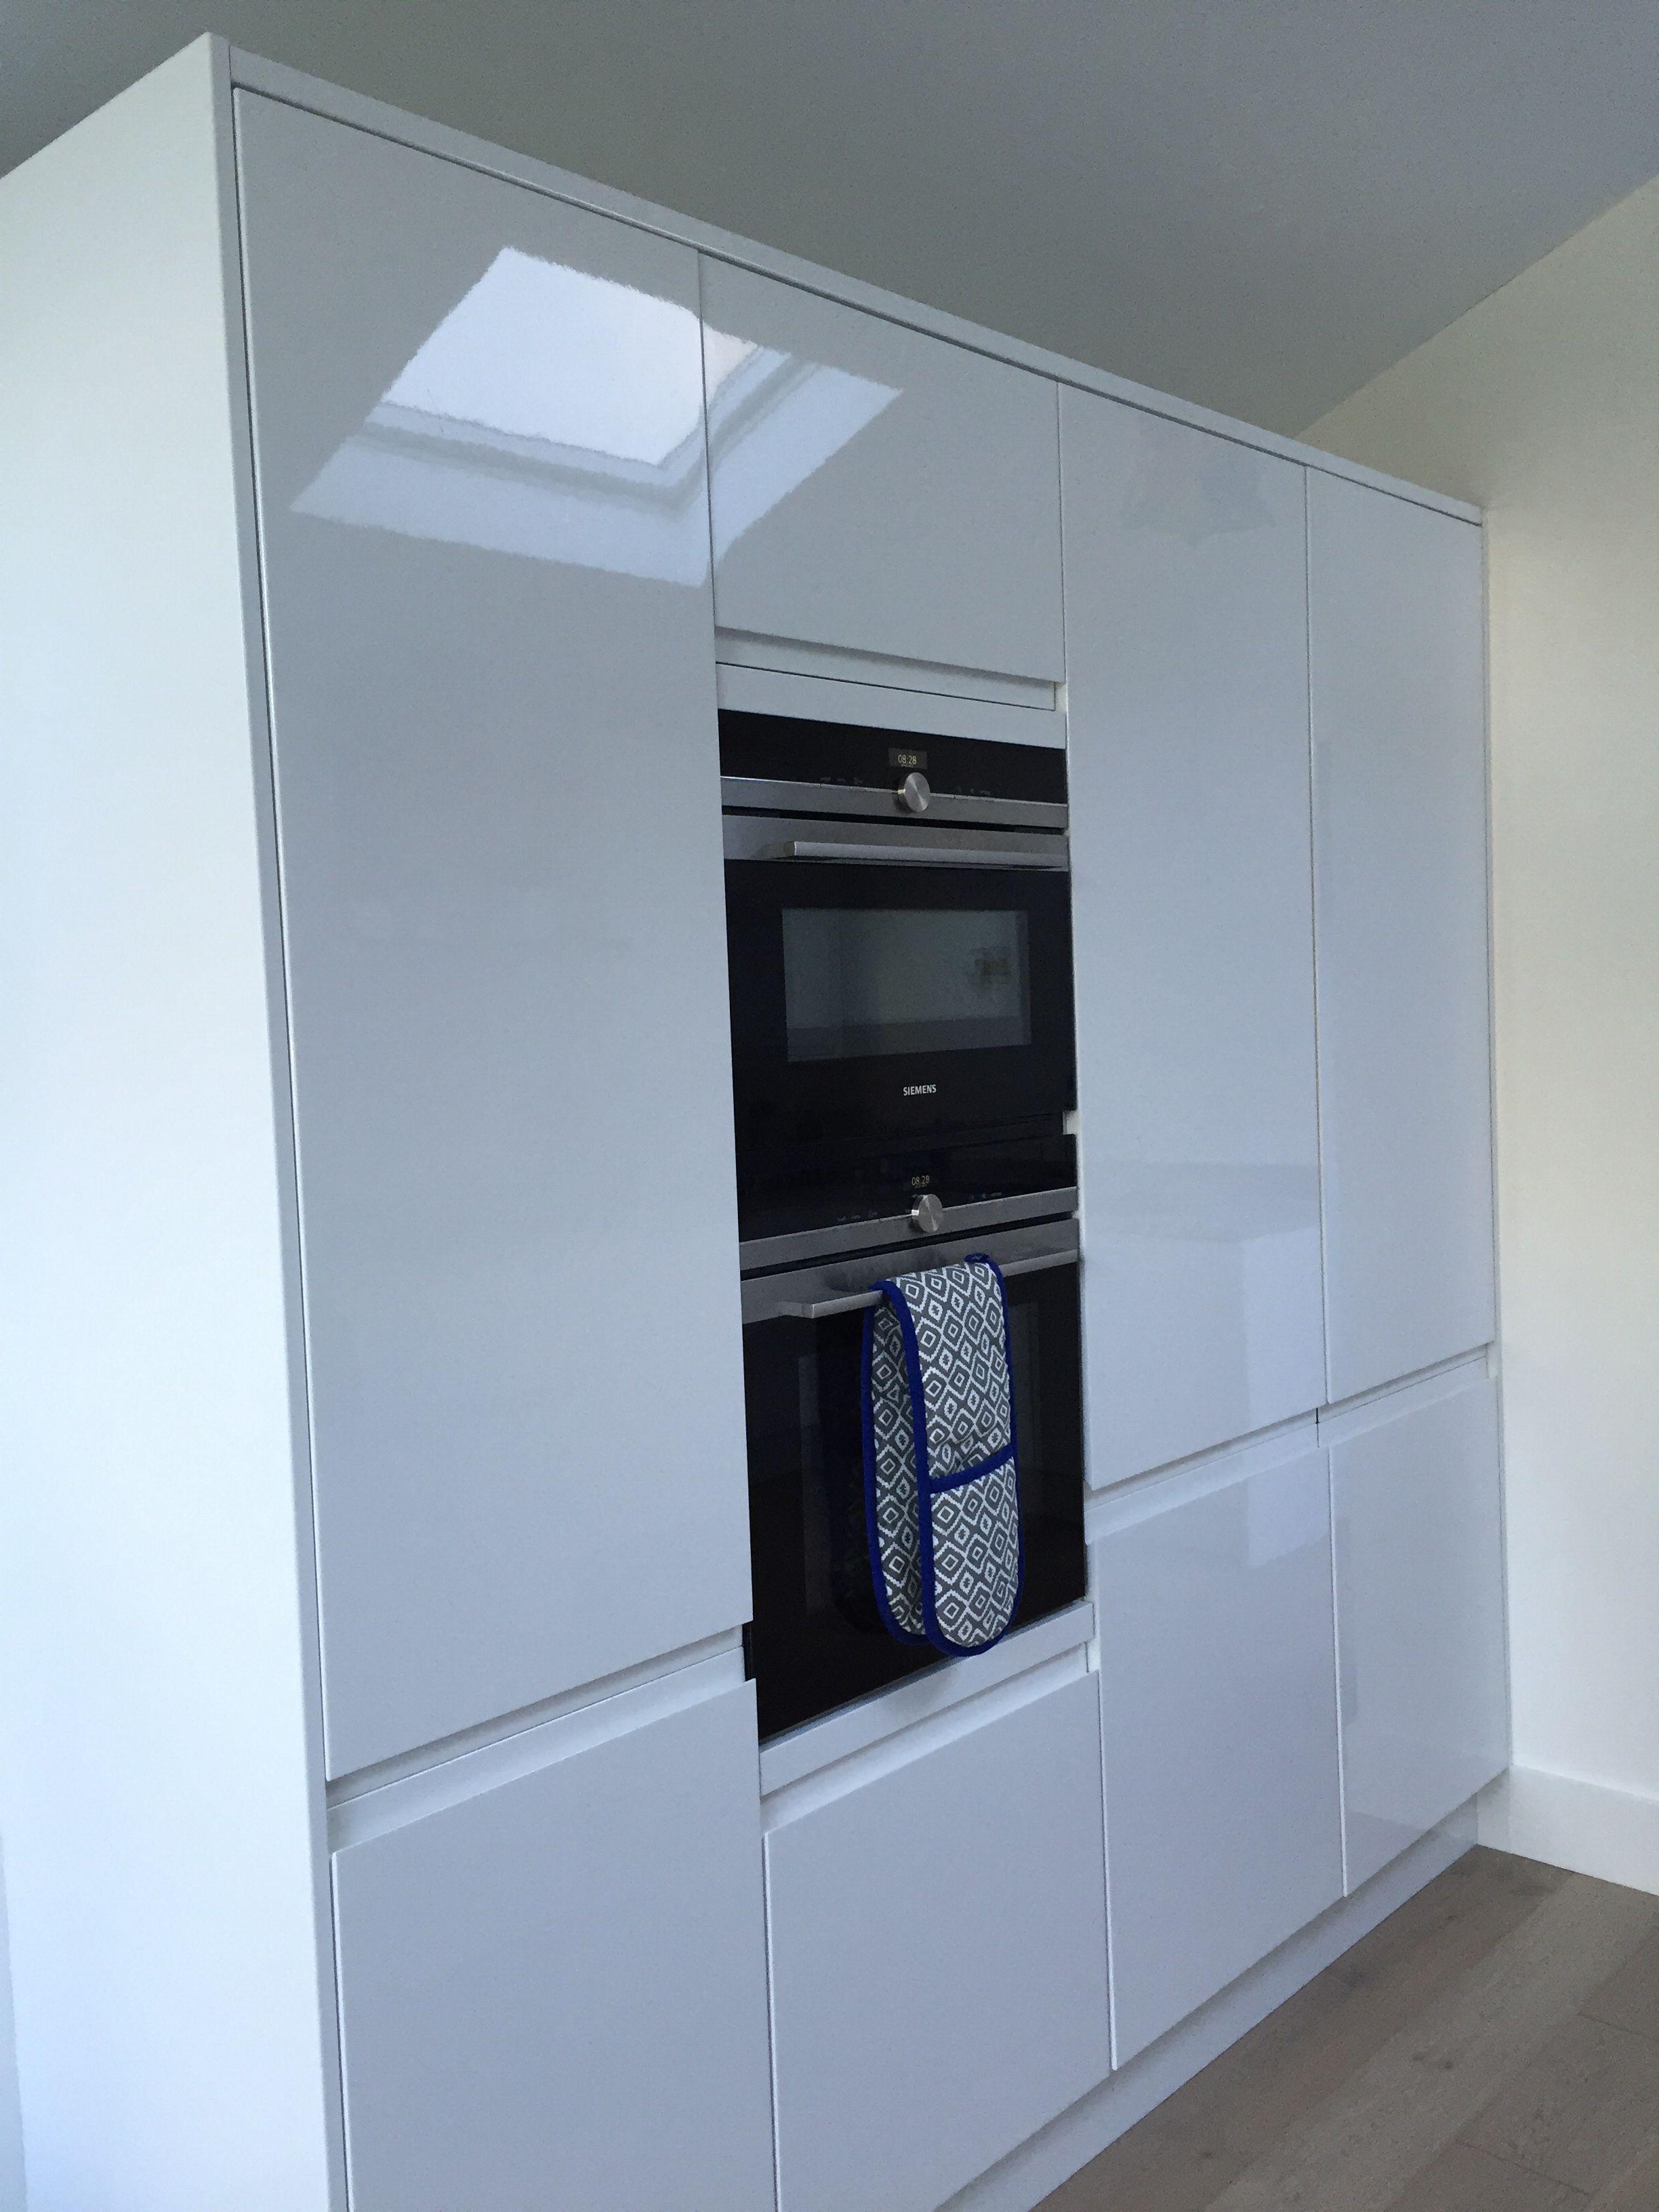 White High Gloss Howdens Handle Less Kitchen, Siemens